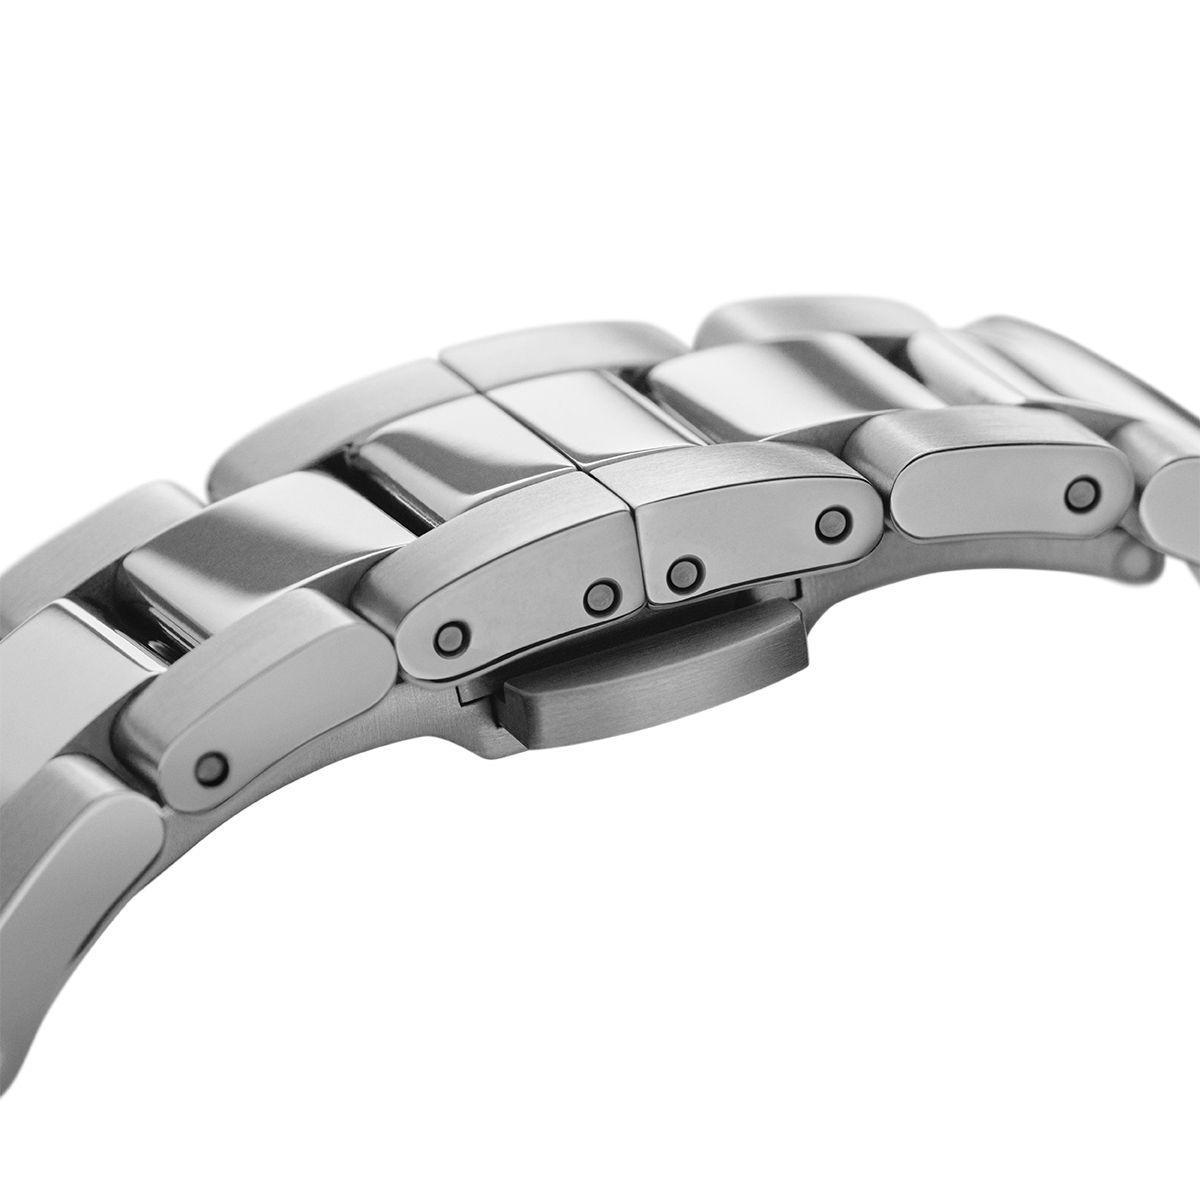 dw官网 dw手表官网 dw中国官网 dw官方旗舰店 DW DW官网  Watch Iconic Black Link Silver 36mm